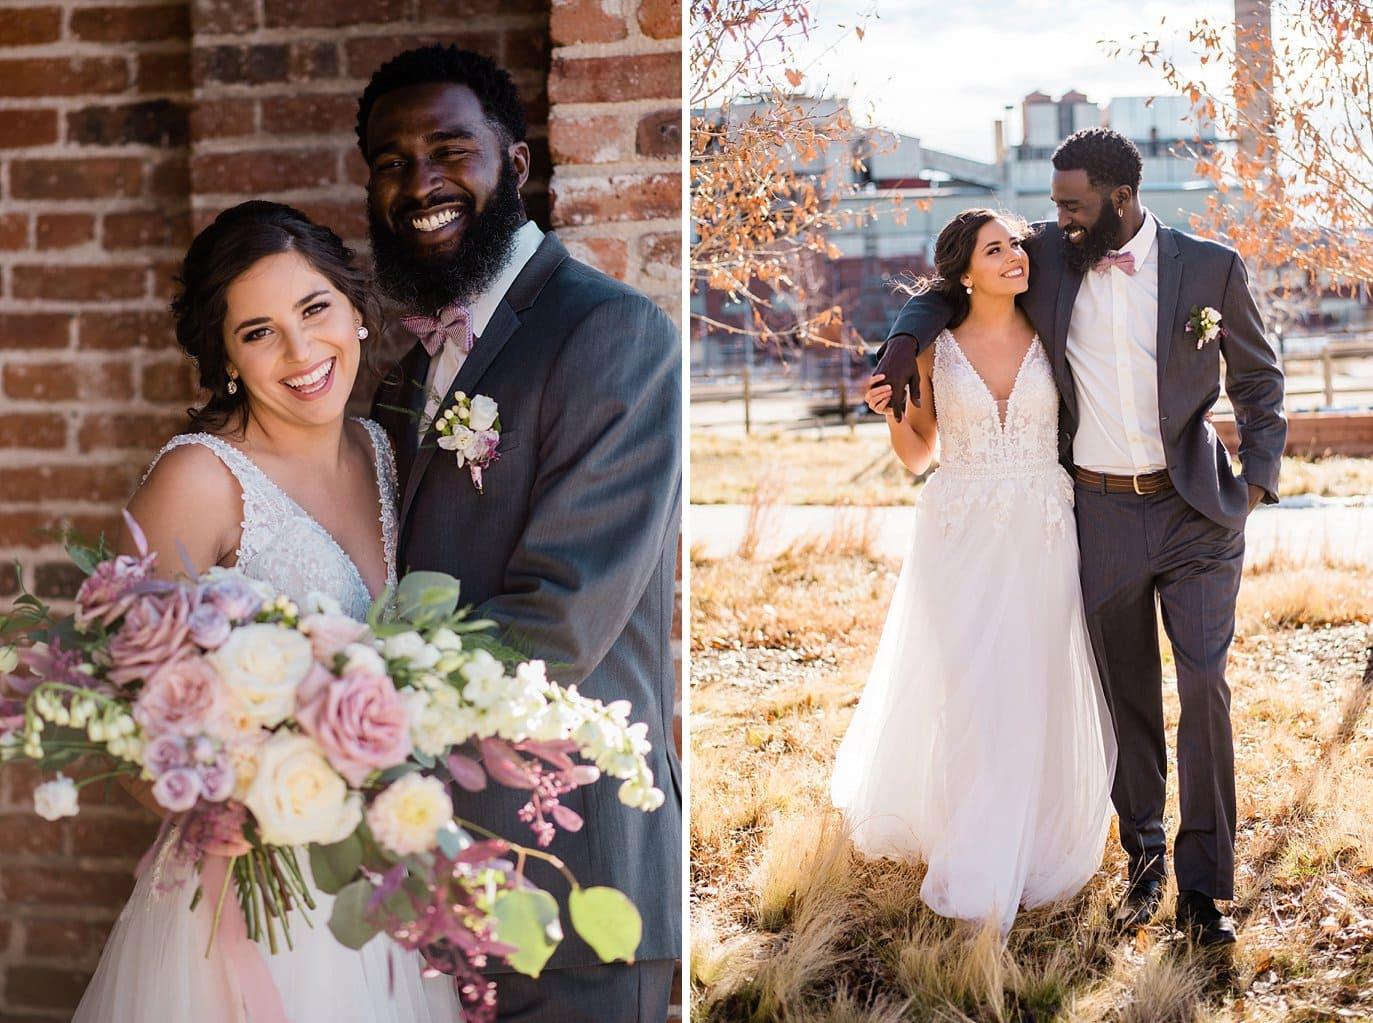 bride and groom in industrial Denver space at Shyft Denver wedding by Boulder Wedding photographer Jennie Crate photographer